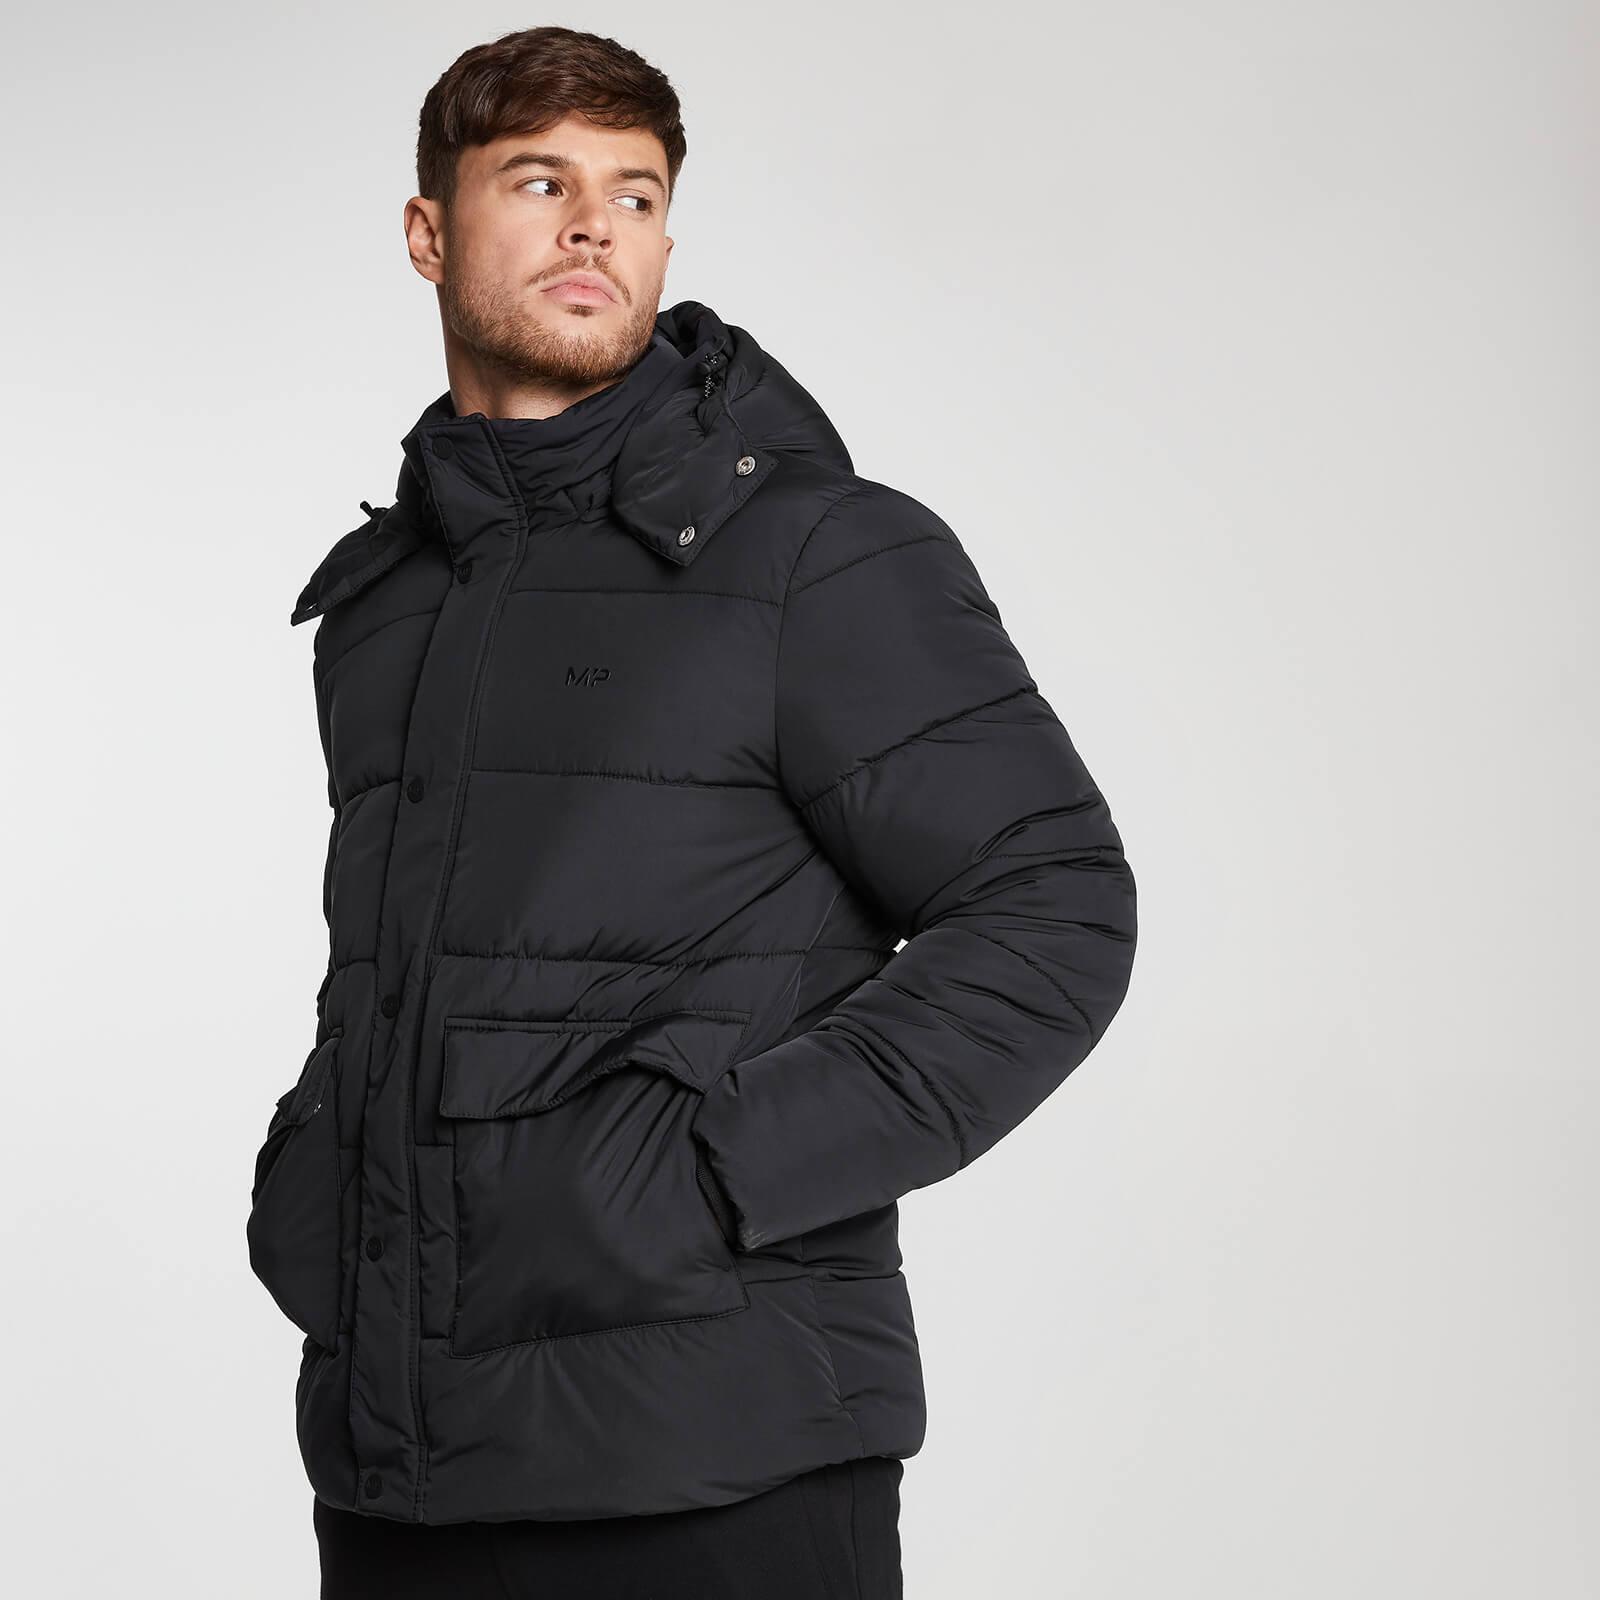 Мужская куртка-пуховик MP Essentials - S